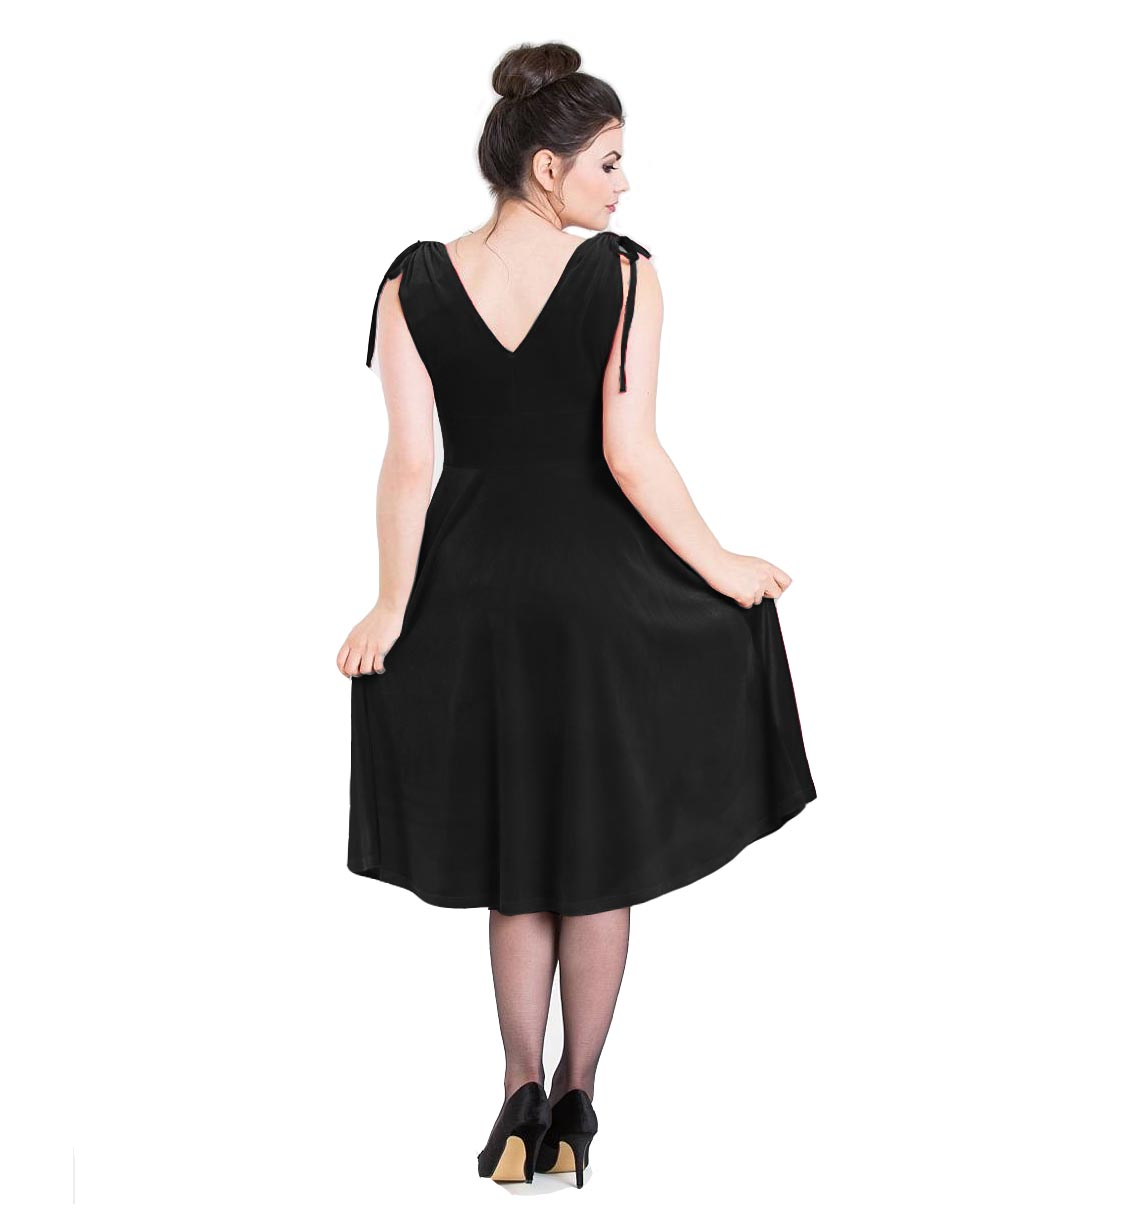 Hell-Bunny-40s-50s-Elegant-Pin-Up-Dress-MELINA-Crushed-Velvet-Black-All-Sizes thumbnail 17